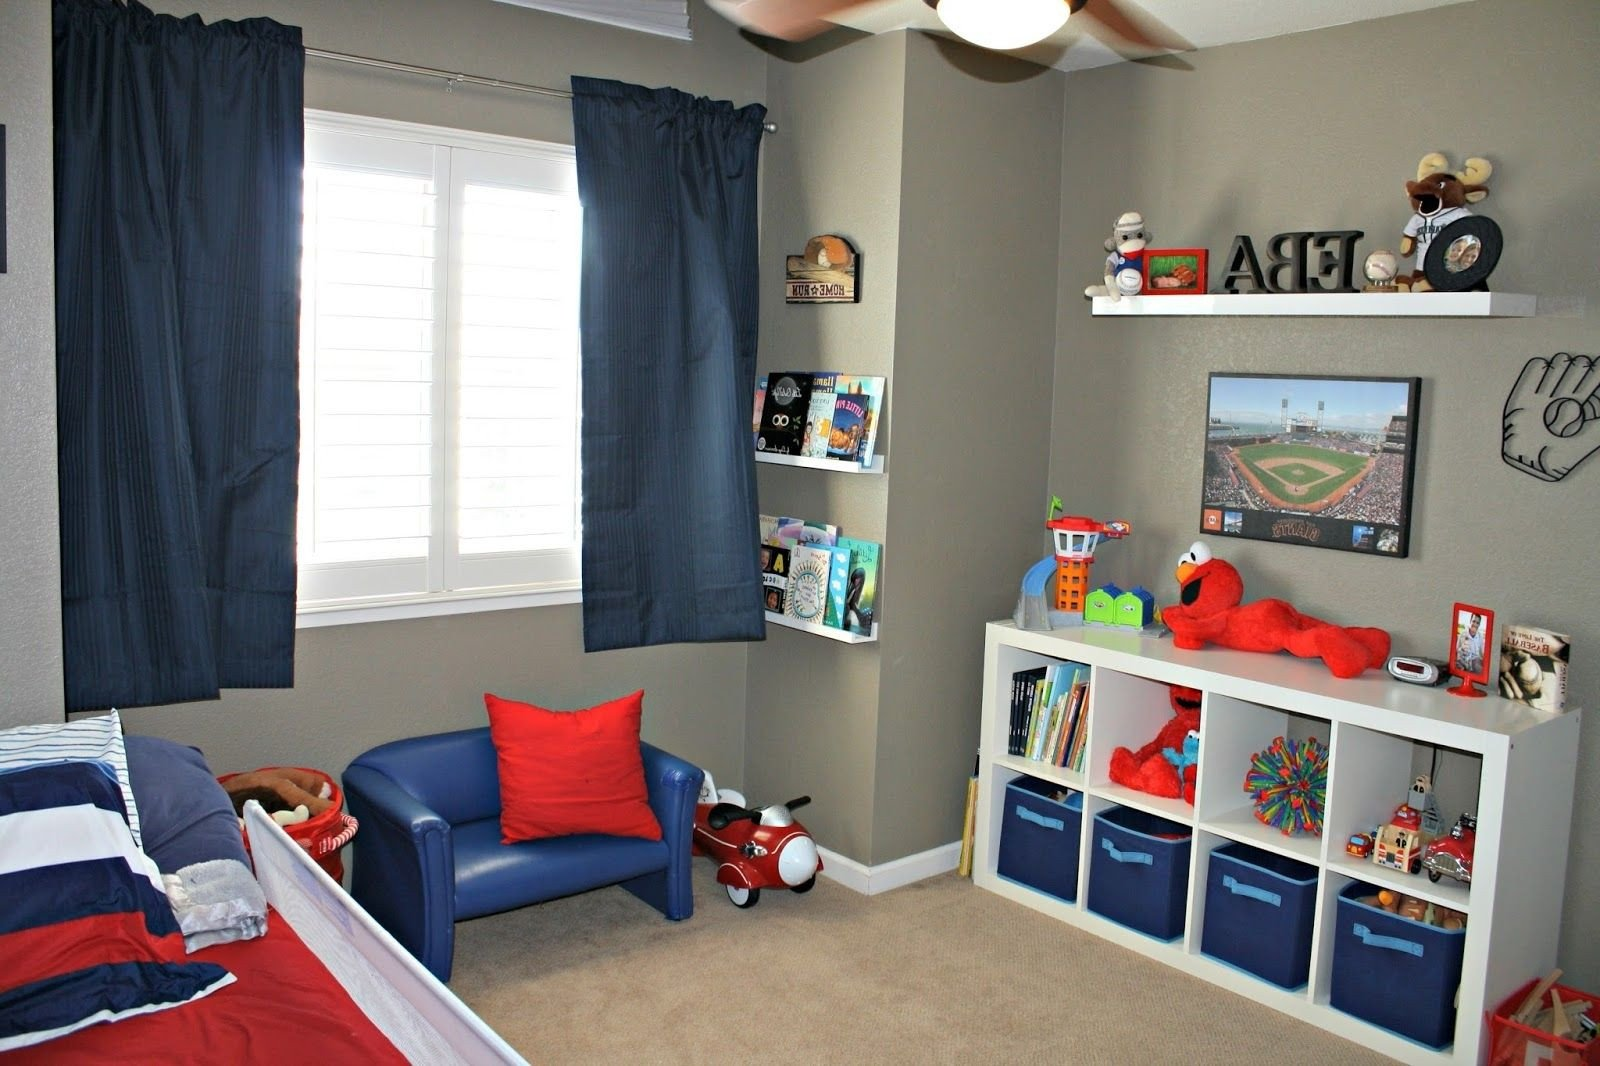 Kids Room Decor for Boys Lovely Boy Bedroom Ideas Visi Build 3d Home Decor In 2019